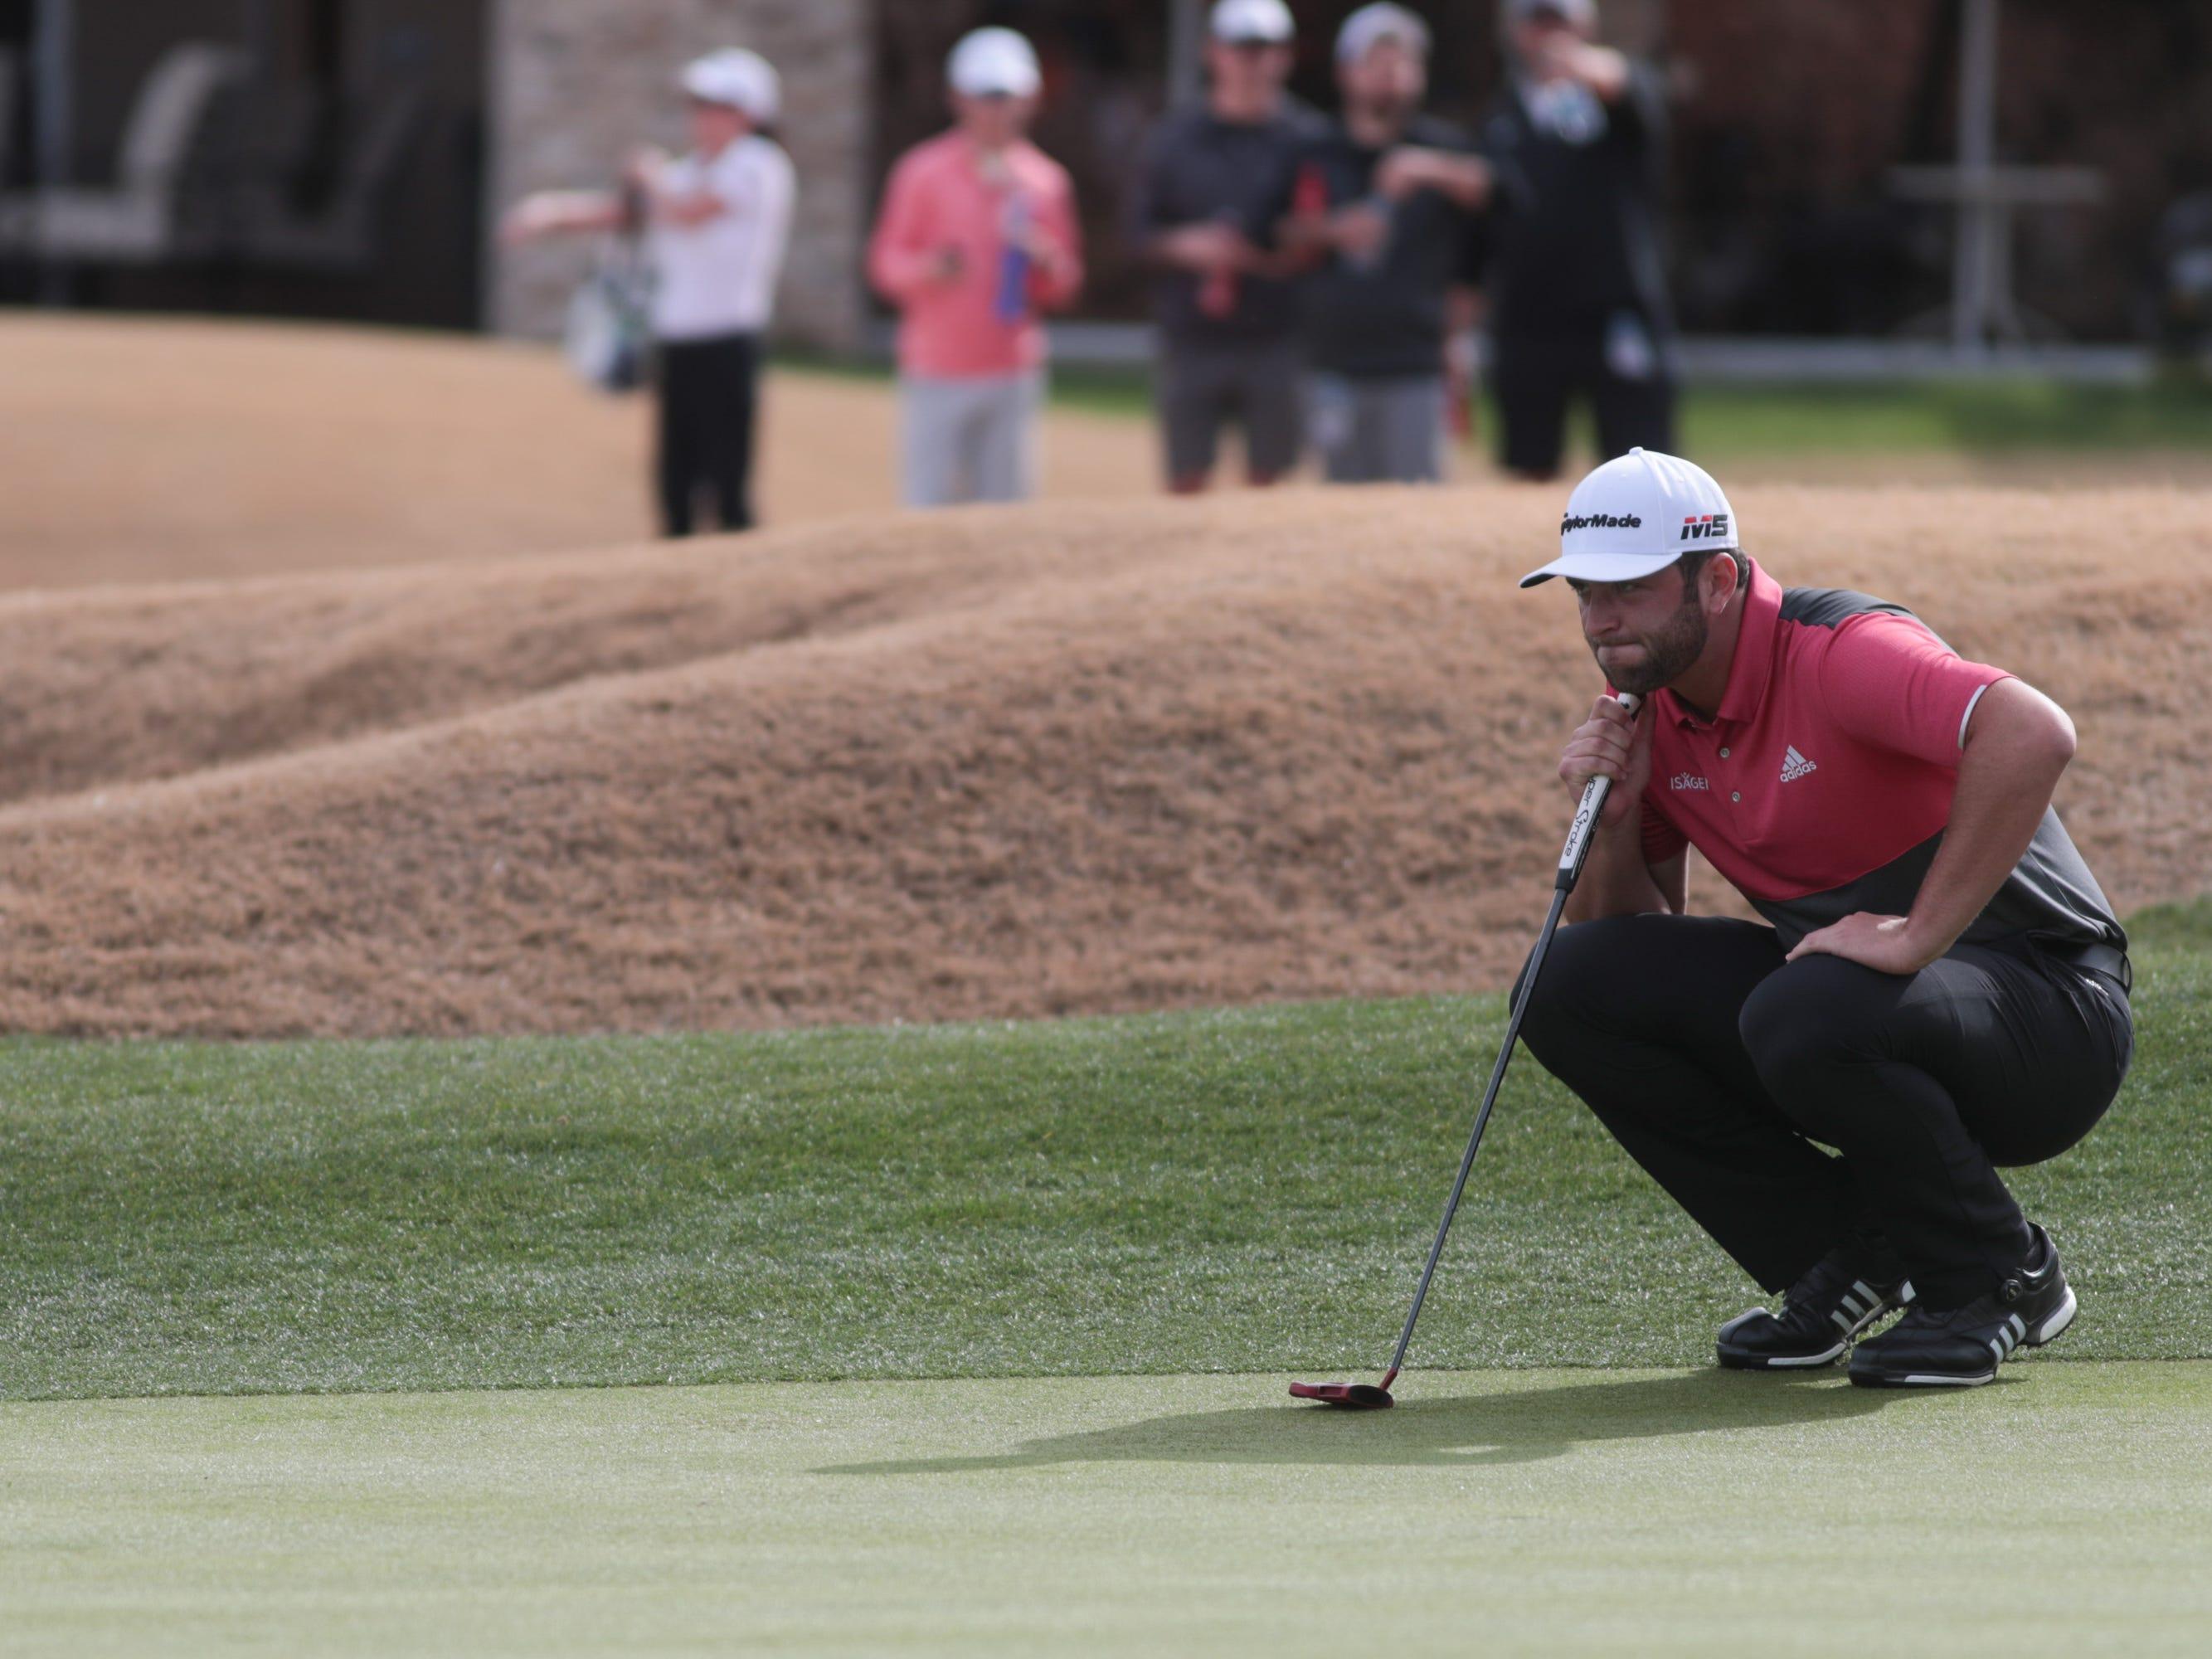 Jon Rahm putts on the 7th hole of the 2019 Desert Classic, Sunday, January 20, 2019.